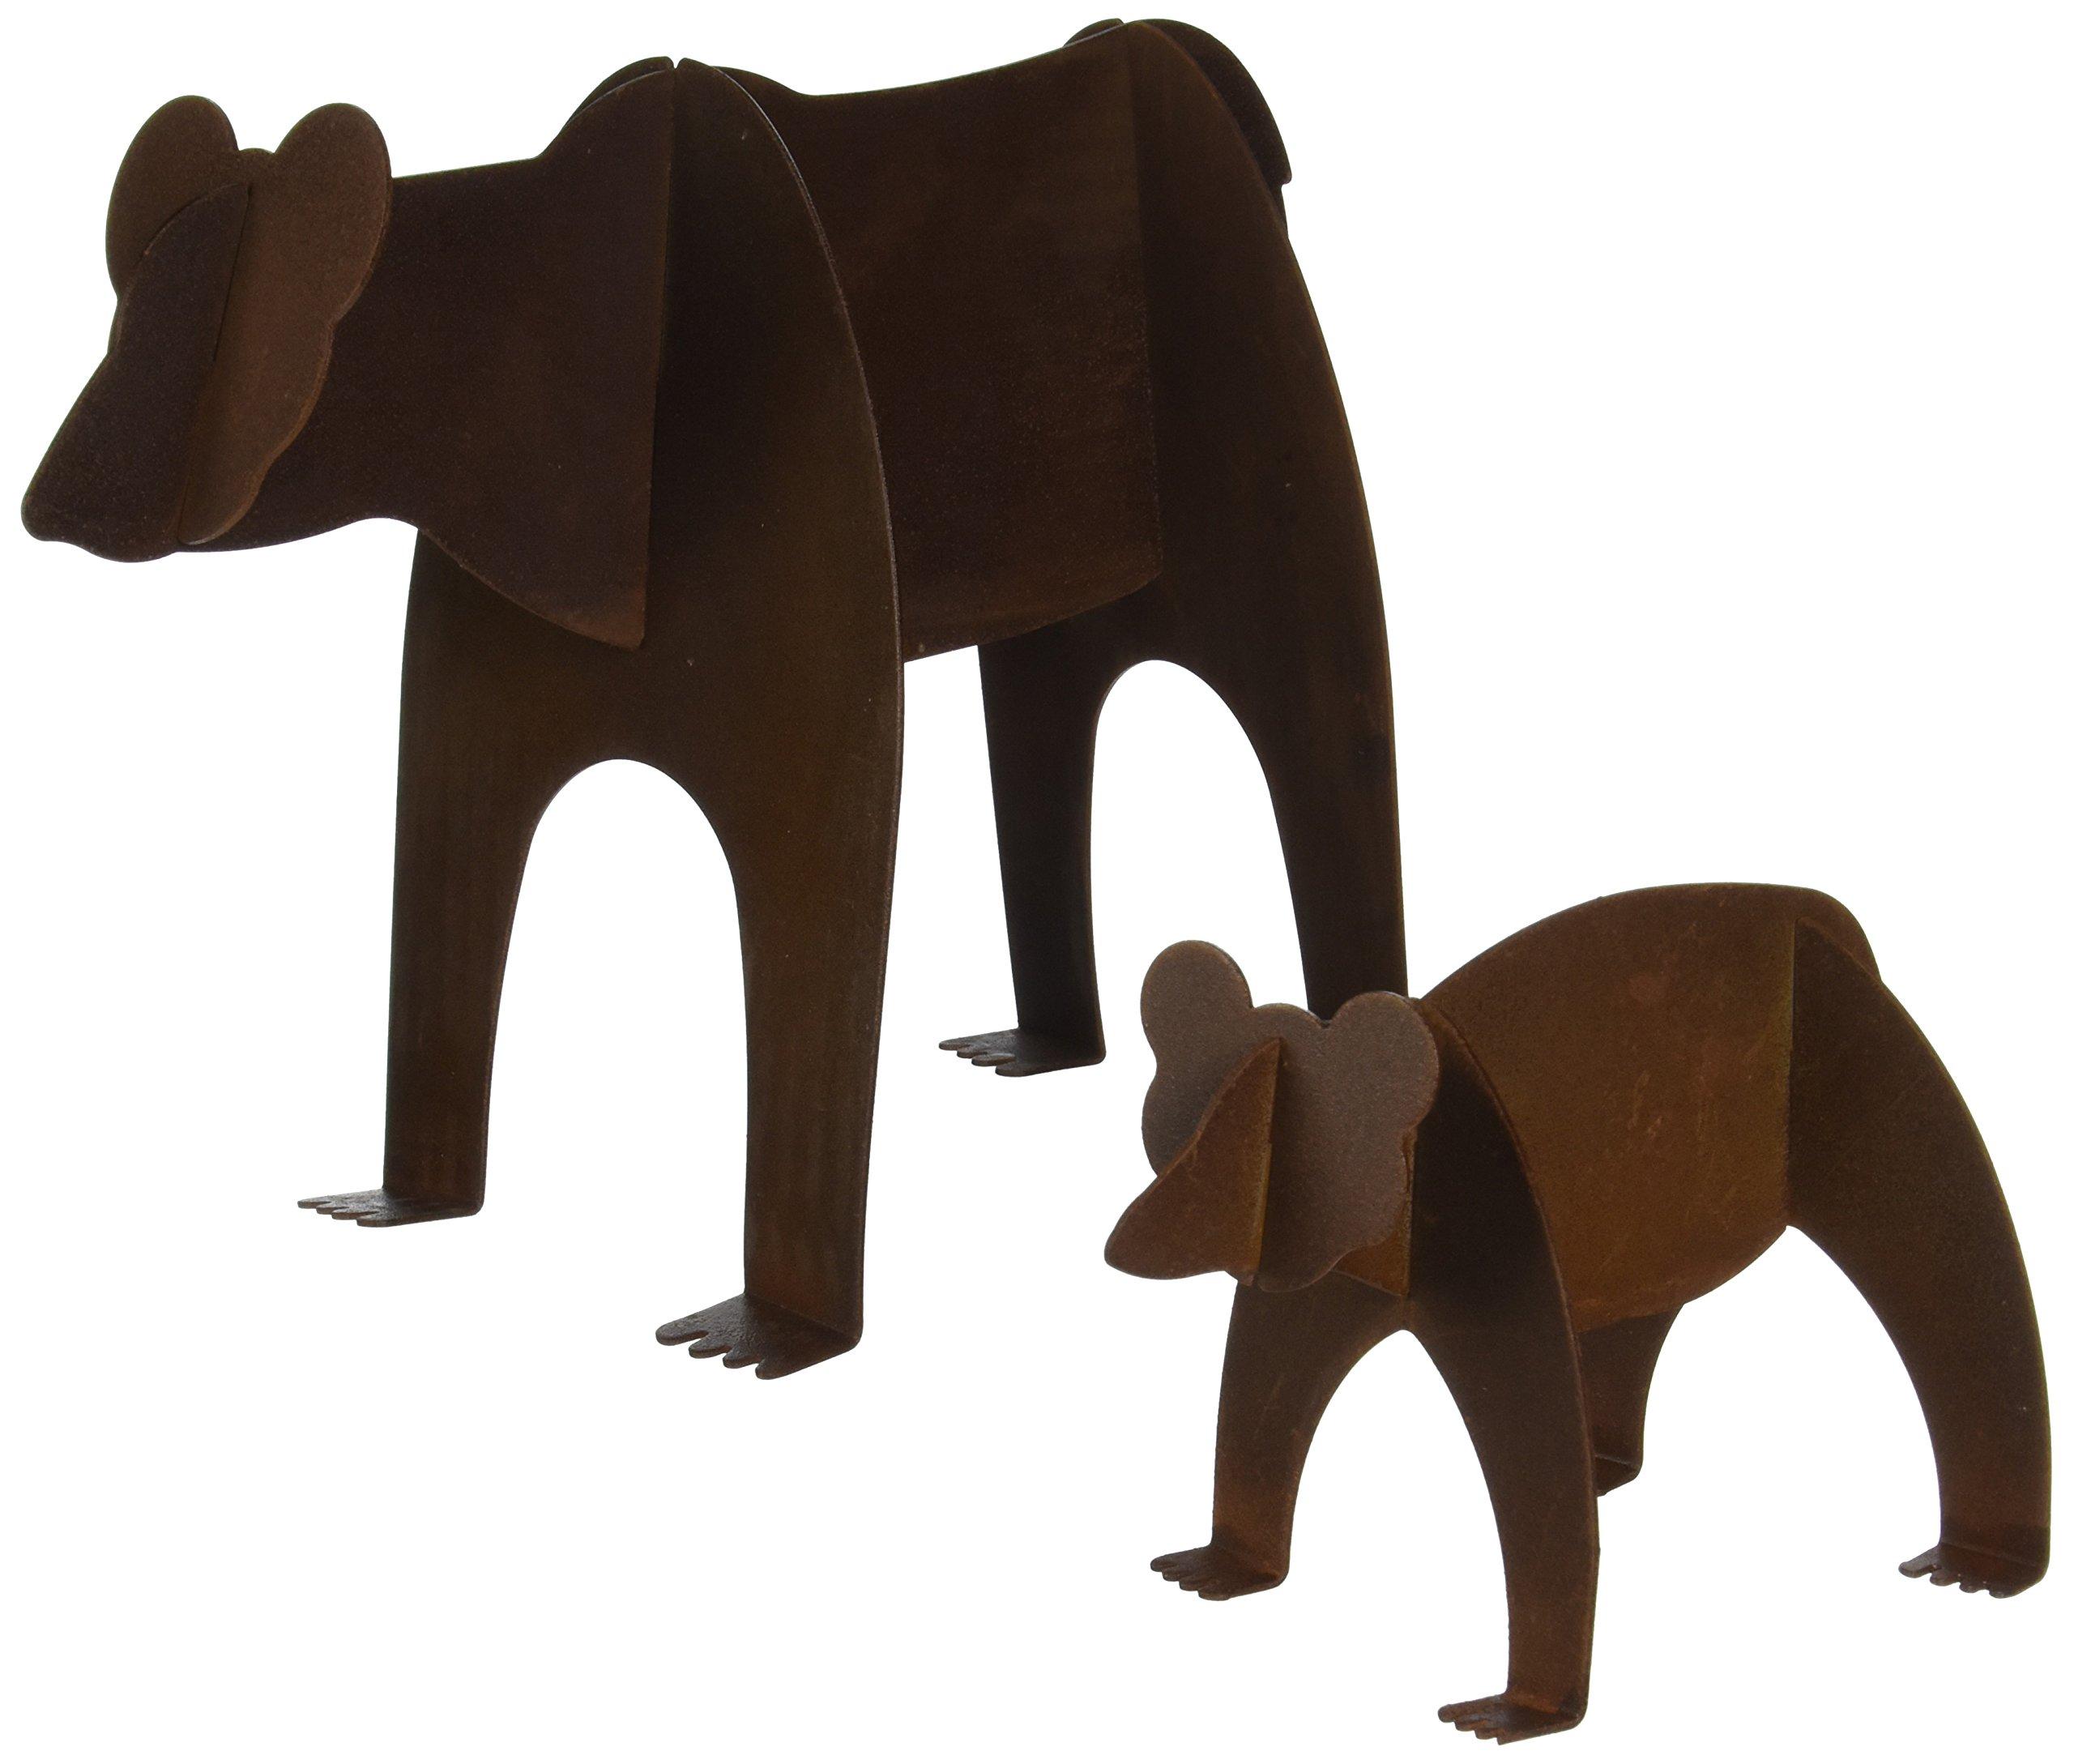 Fantasy Fauna MSSB-67 Bear and Cub Pre-Rusted Steel Sculpture, Medium Size